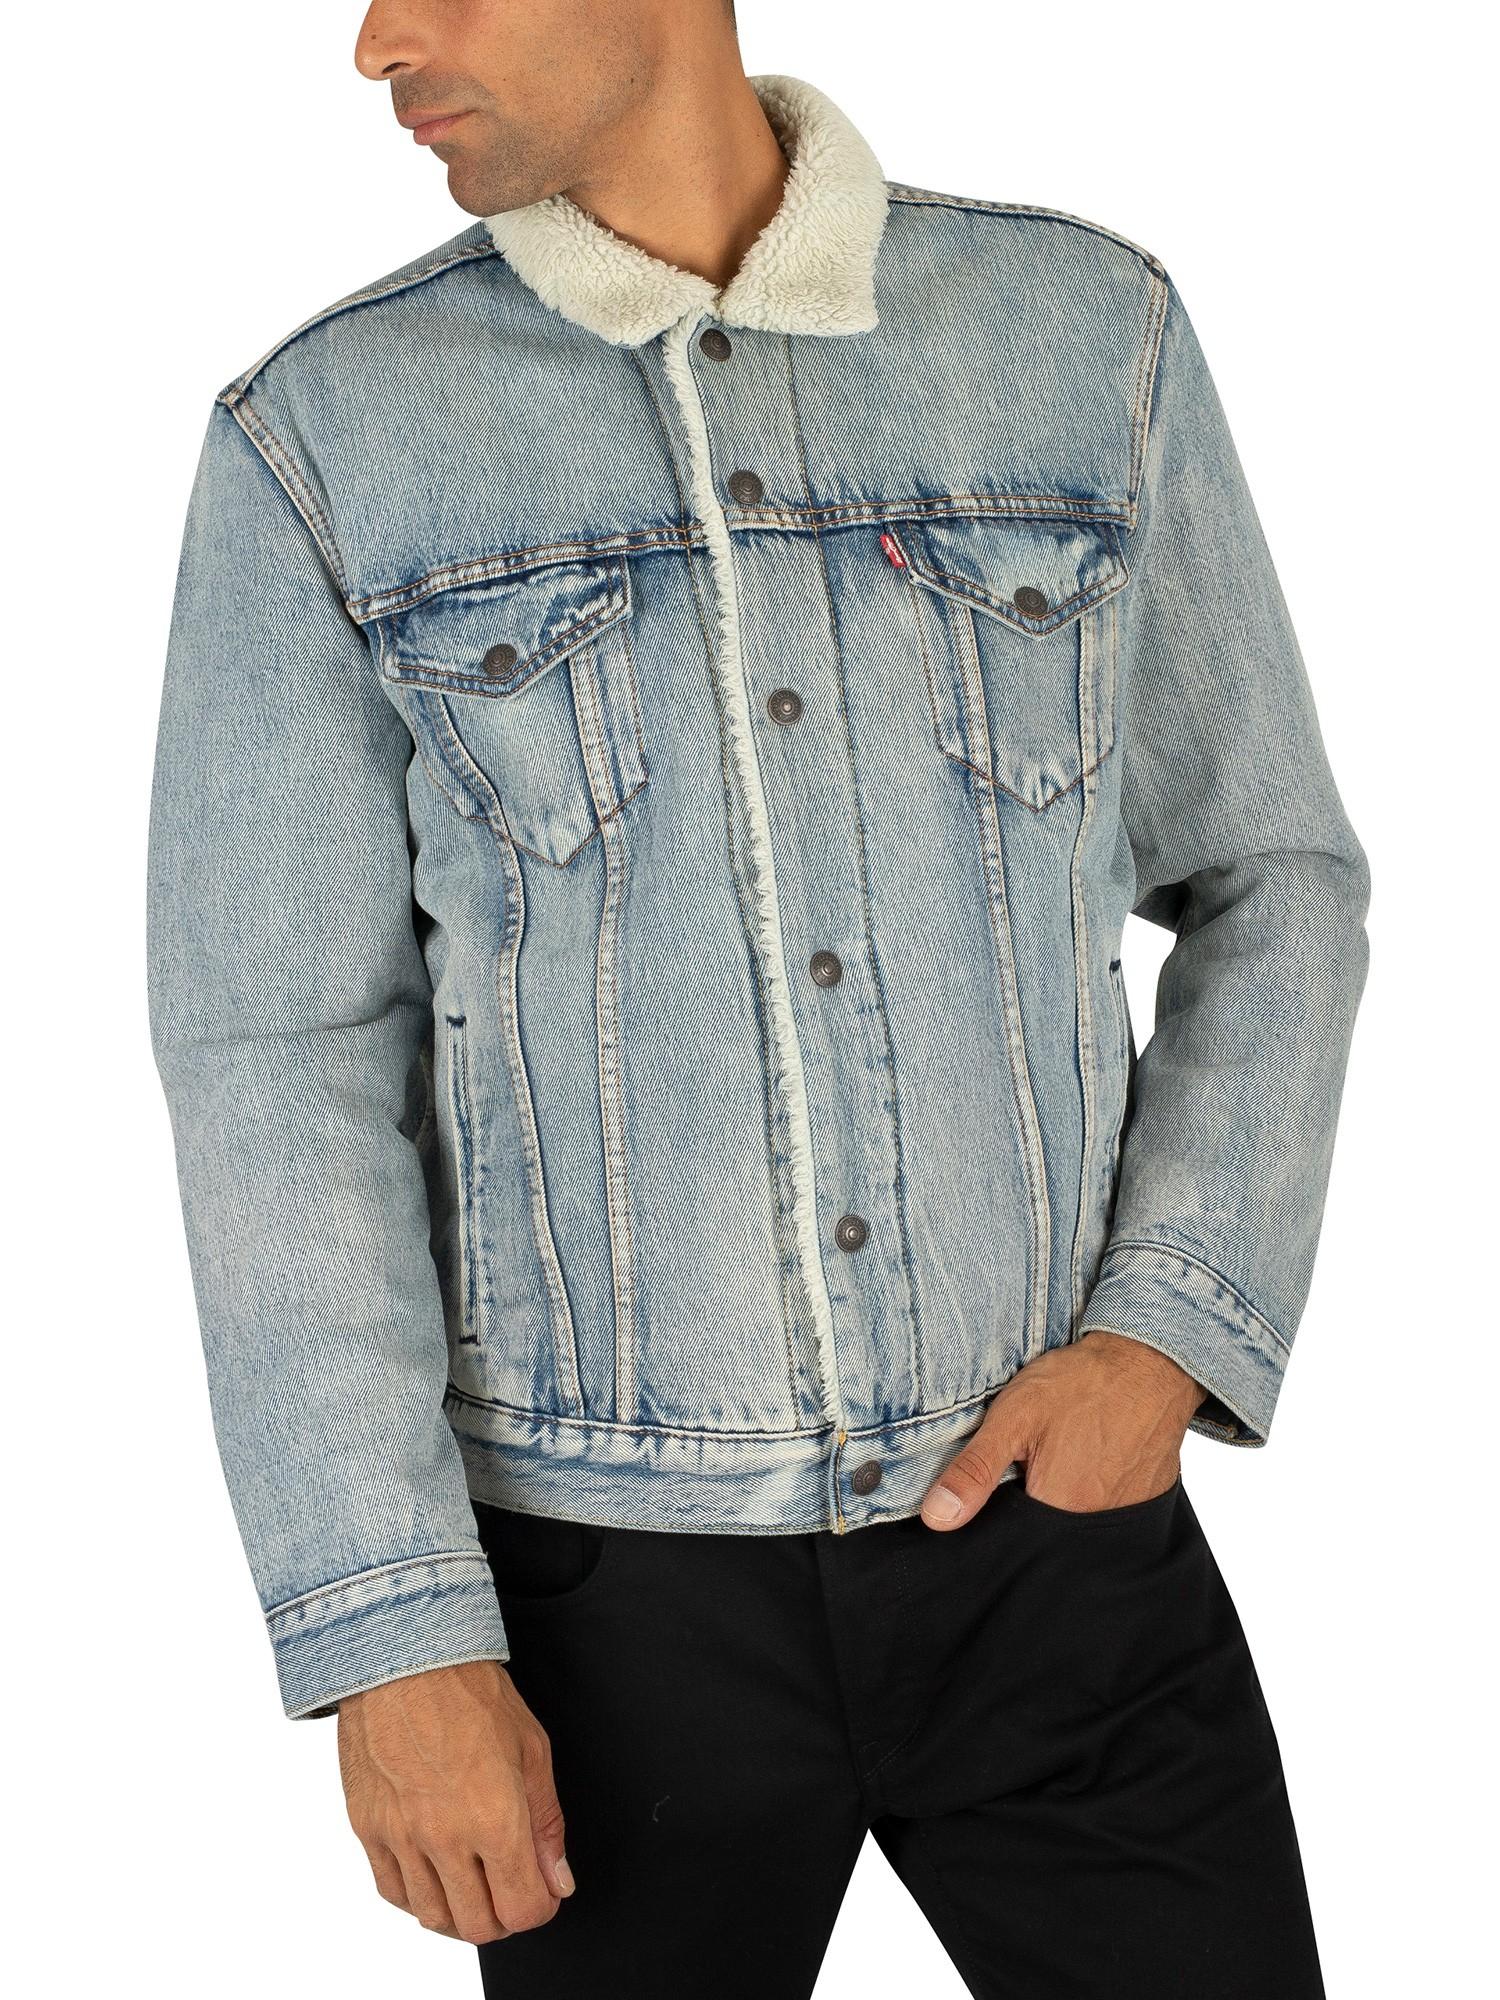 Levi's Sherpa Trucker Jacket £57.95 @ Stonebridge